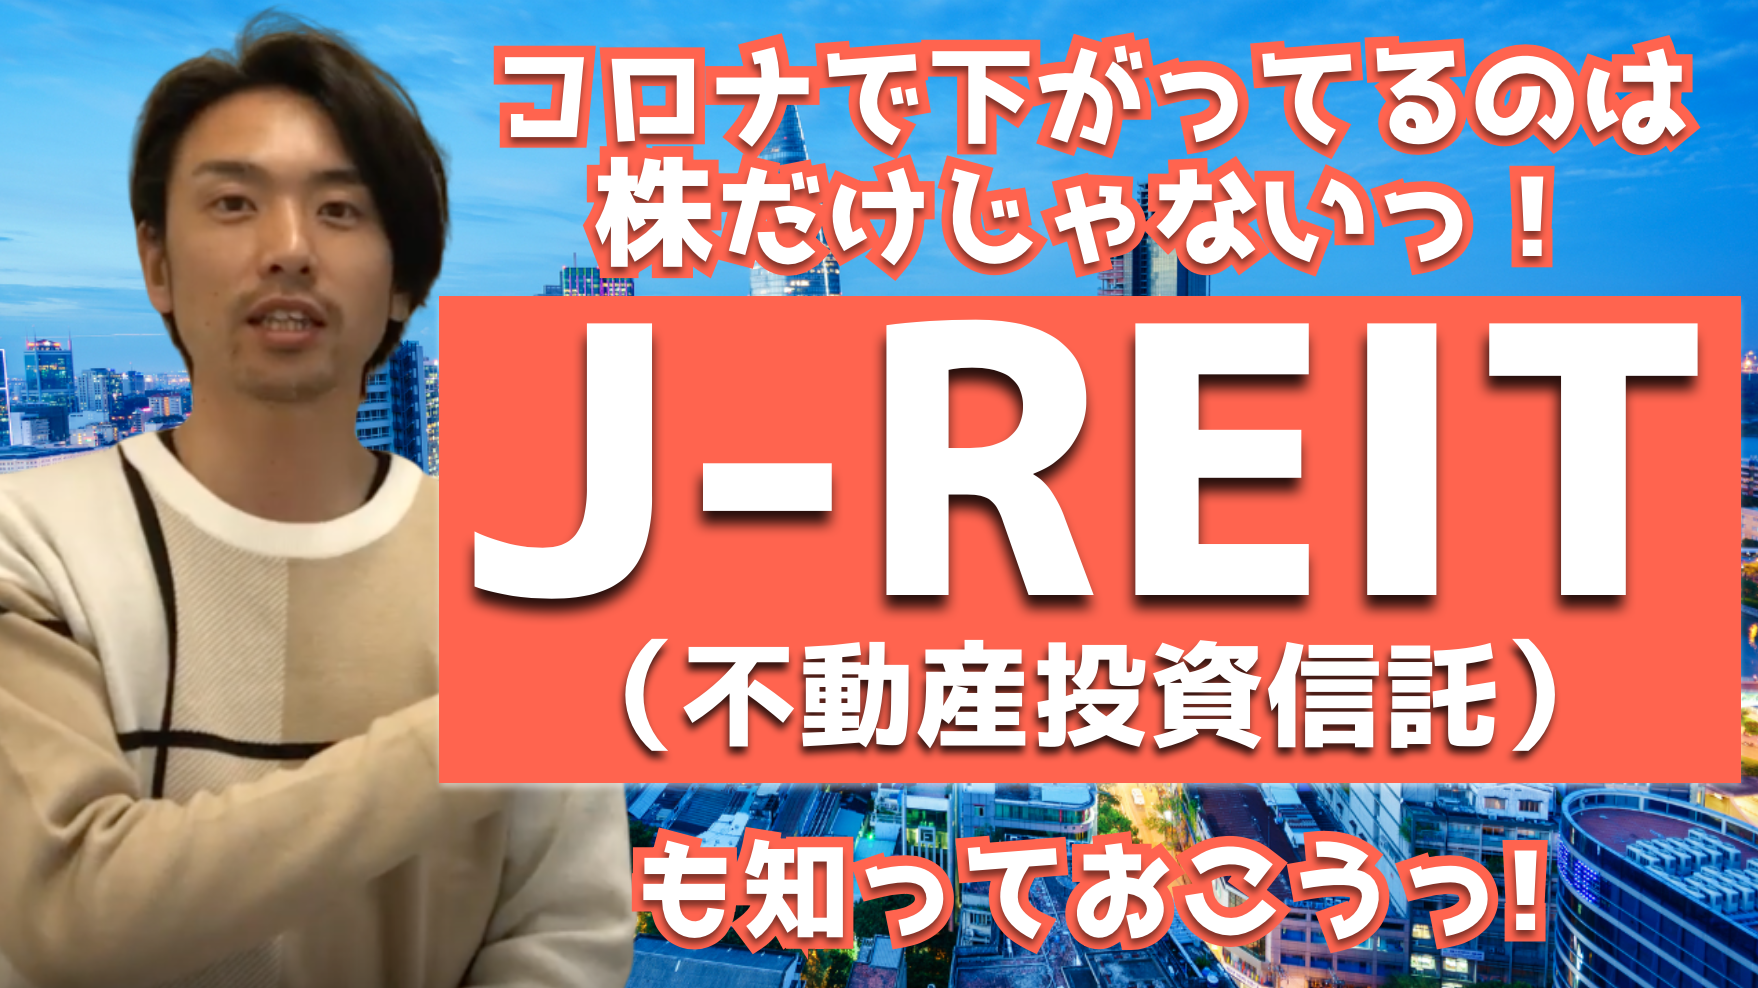 【J-REIT】不動産投資とどっちが良い? 〜7年ぶりの安値到来!J-REITの魅力を解説〜